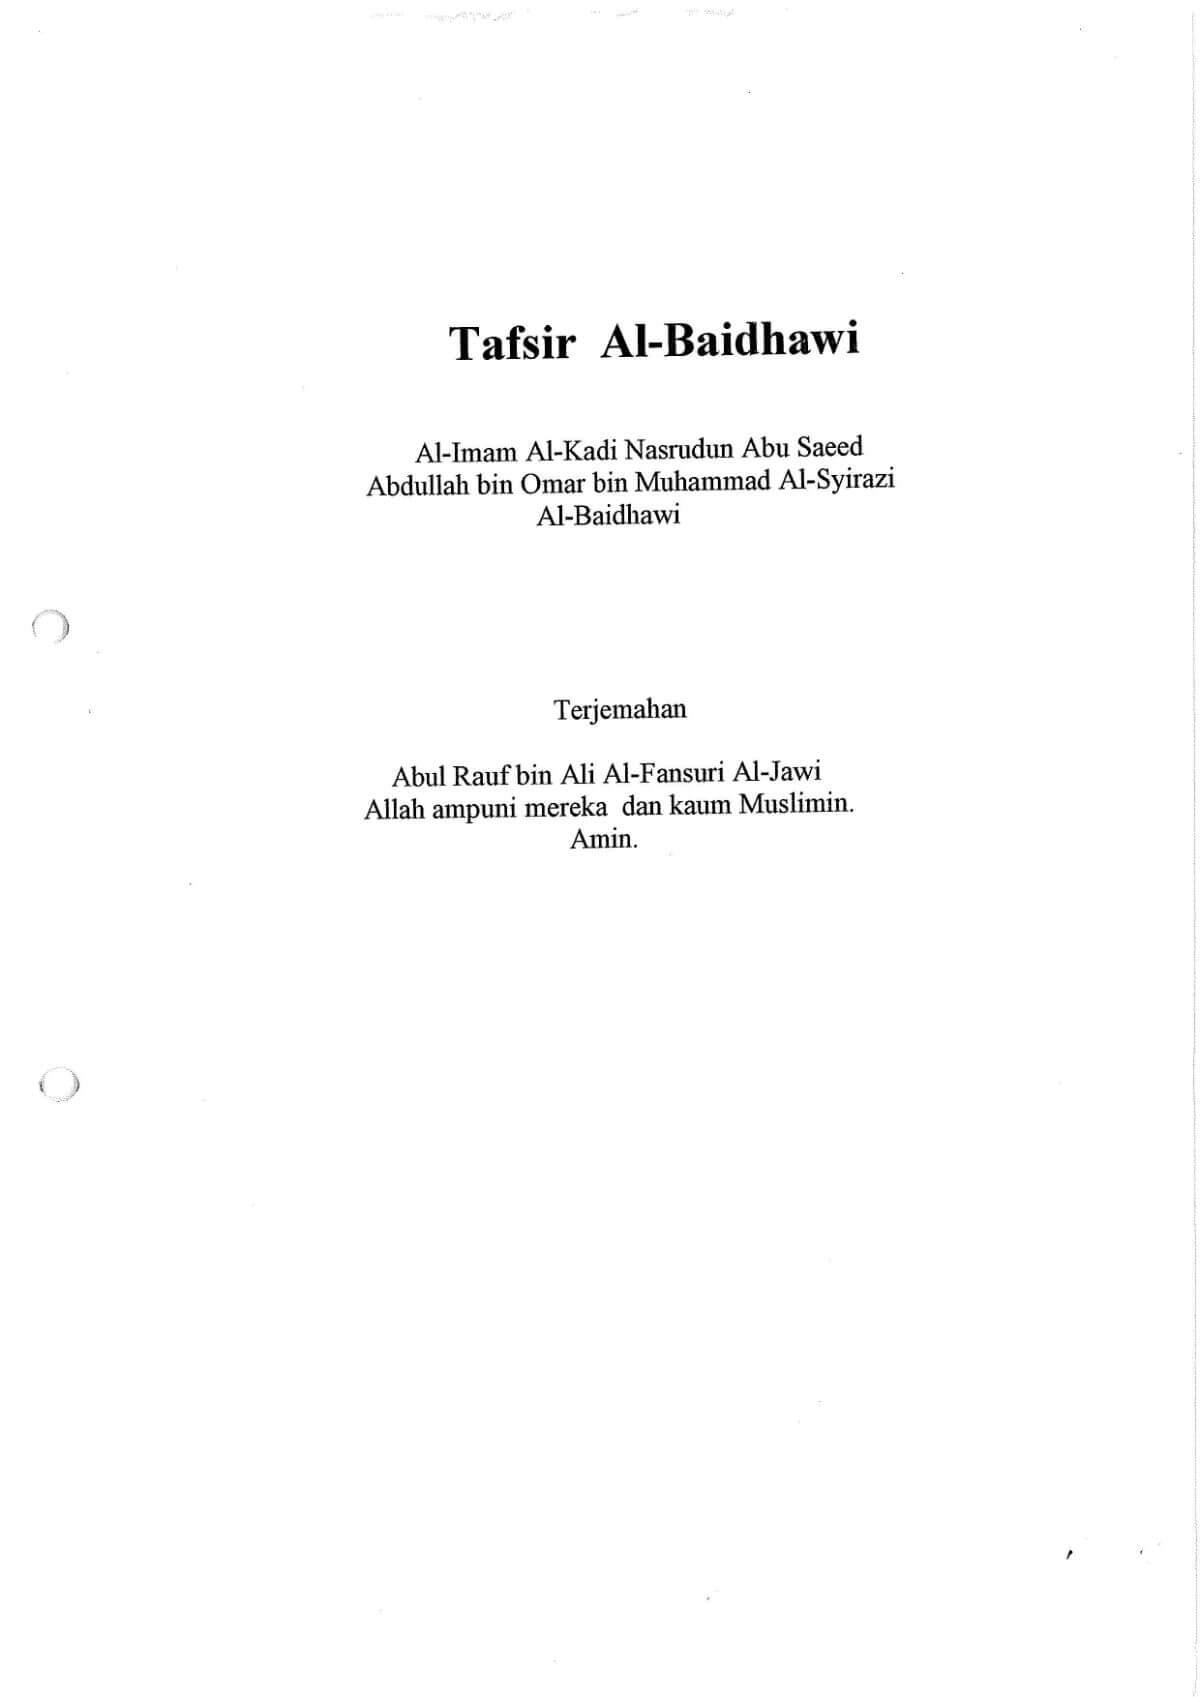 Tafsir Baidhawi- Al Marhum Shaikh Jaafar Banafae_Page_1